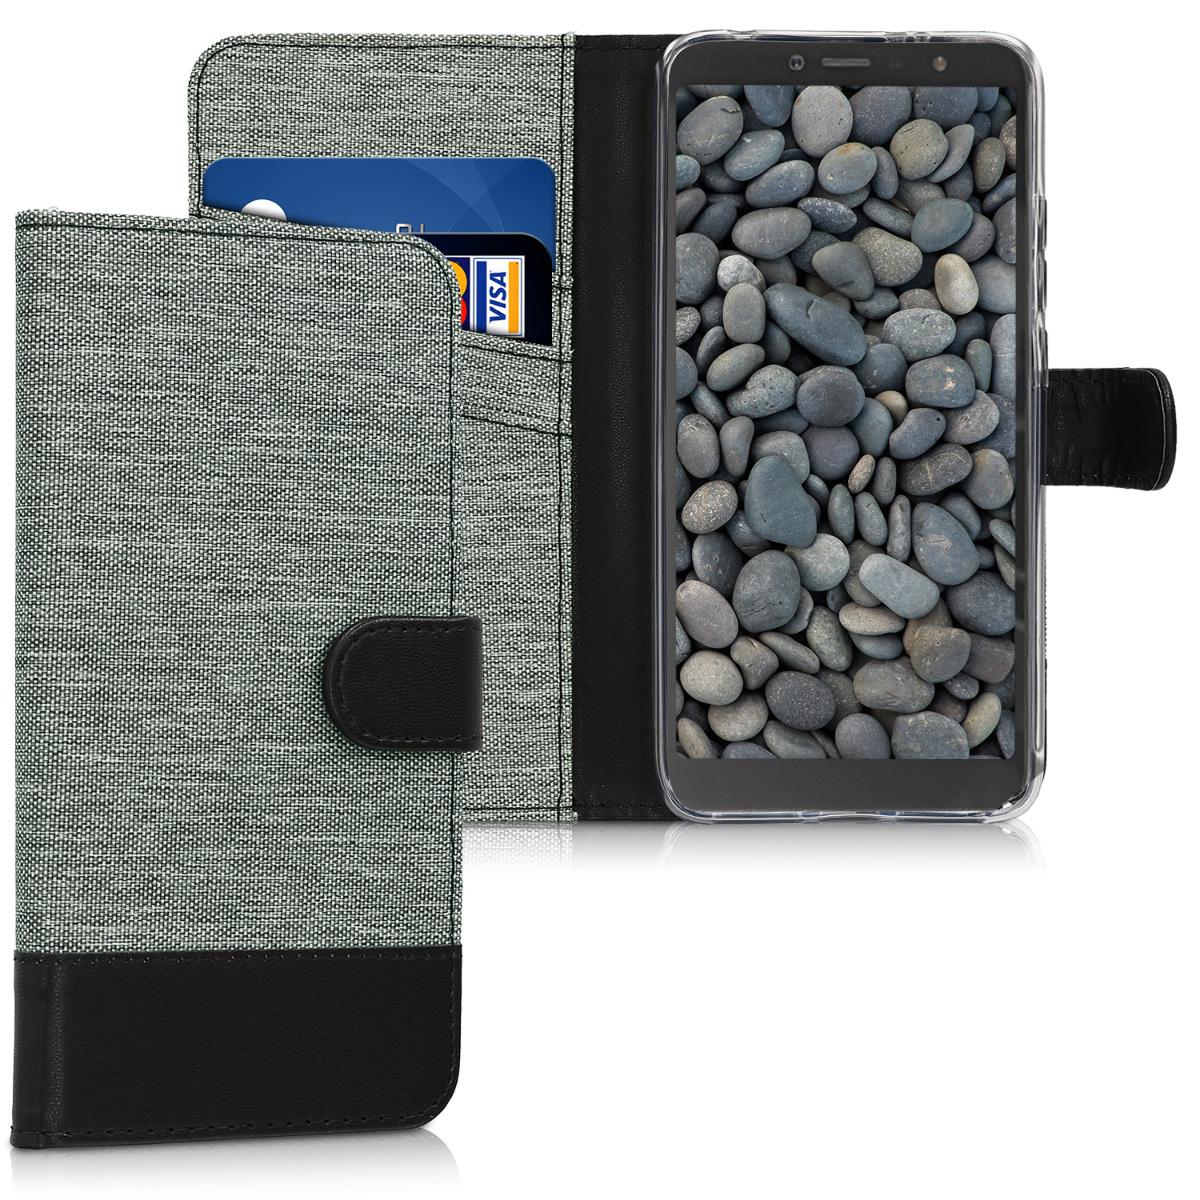 KW Θήκη-Πορτοφόλι Xiaomi Redmi S2 - Grey / Black Canvas (45871.22)